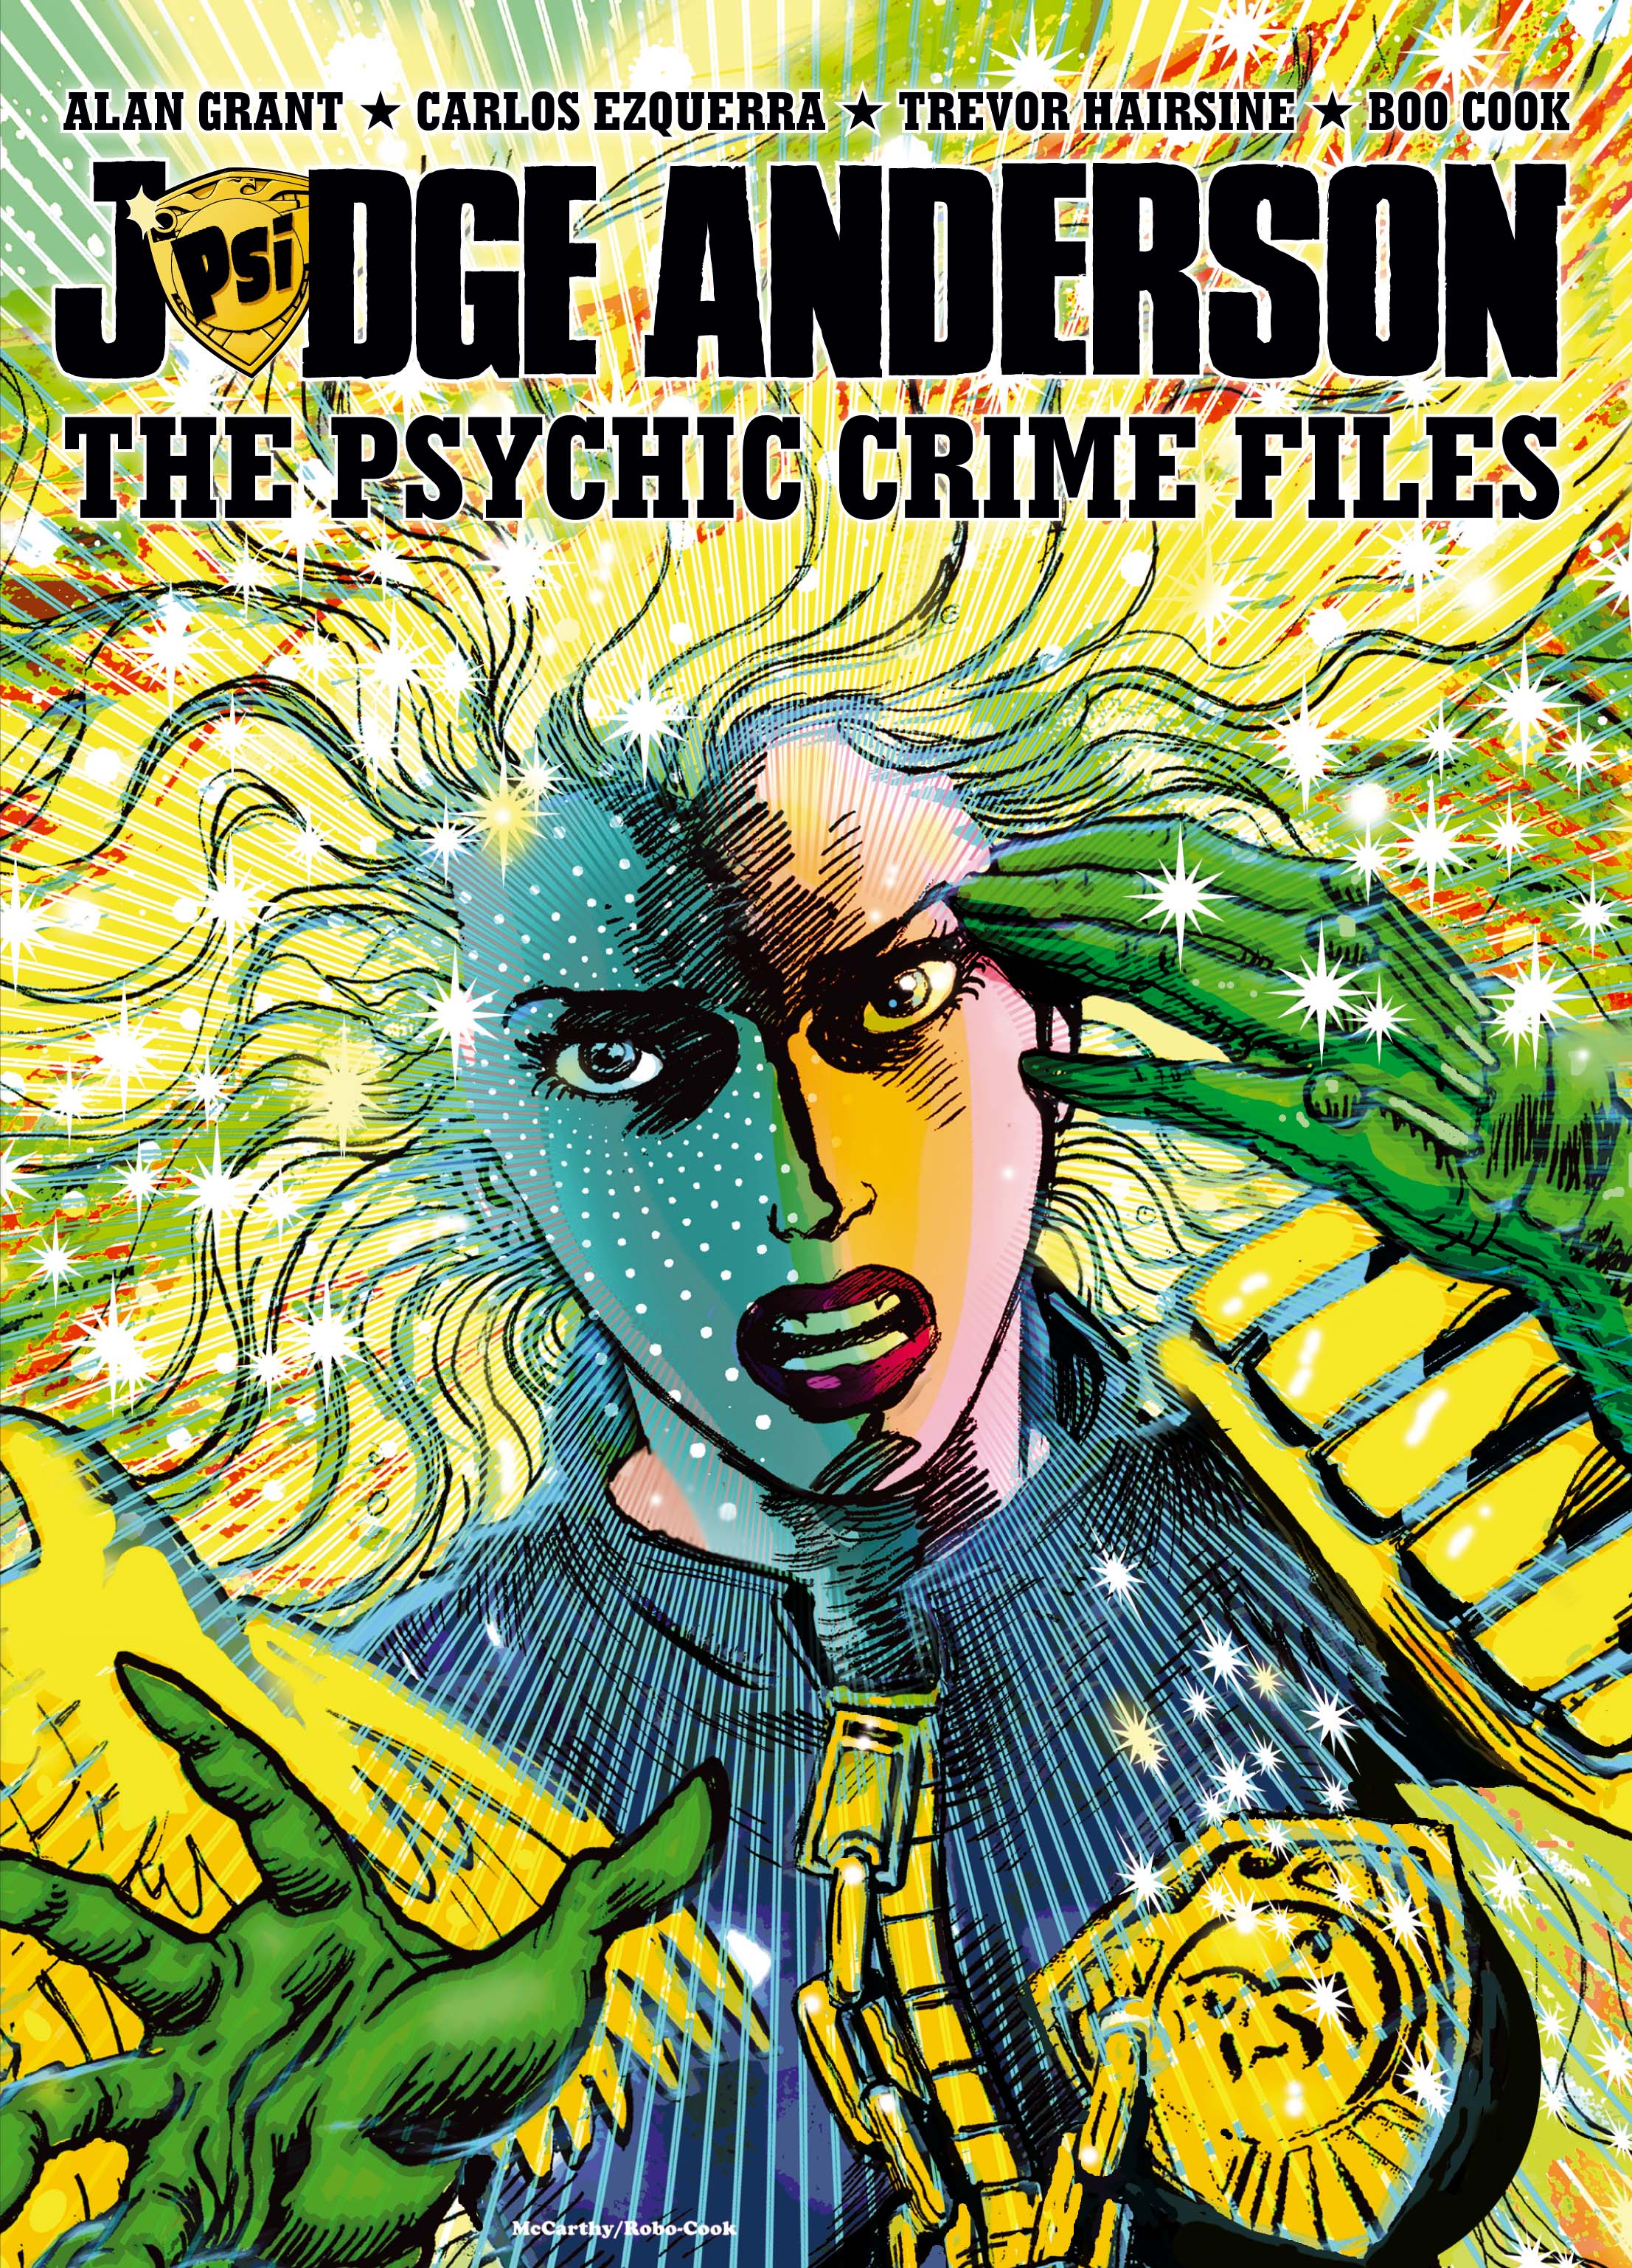 Power Archetype: The Mentalist